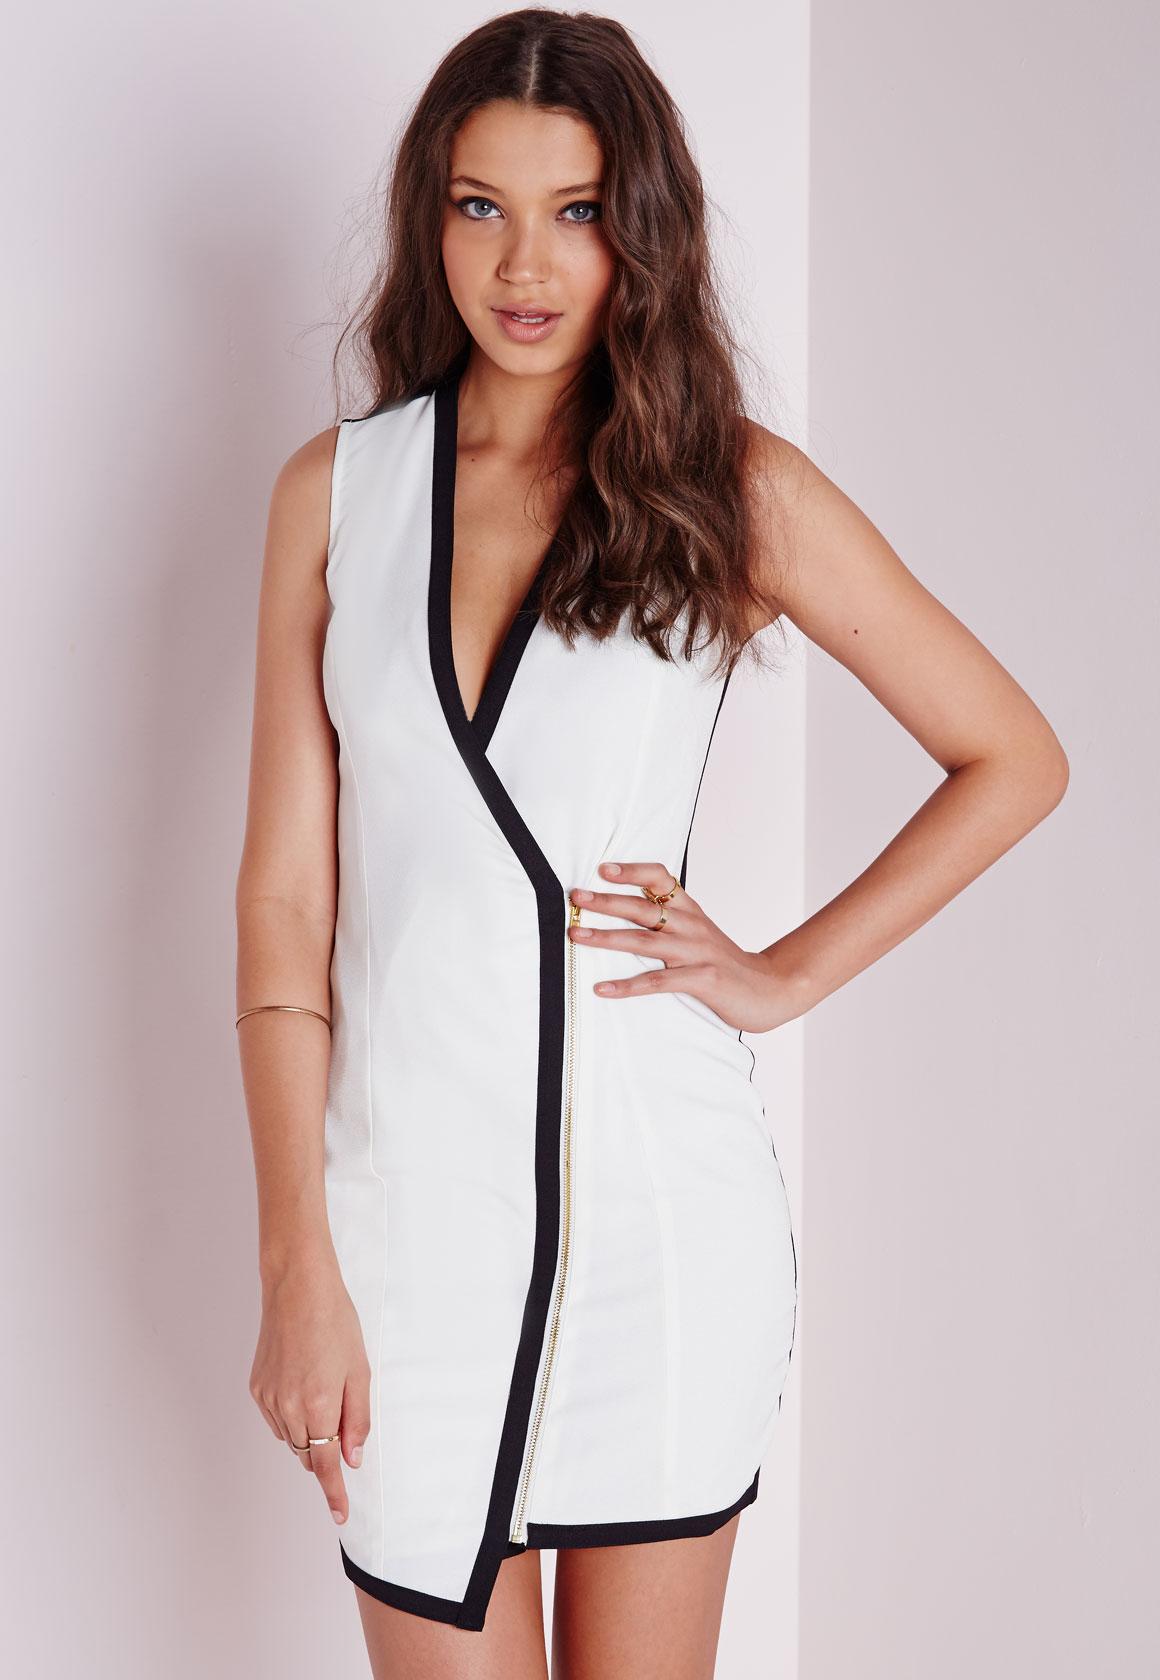 77b55605008c58 Missguided Crepe Sleeveless Contrast Wrap Blazer Dress White in ...